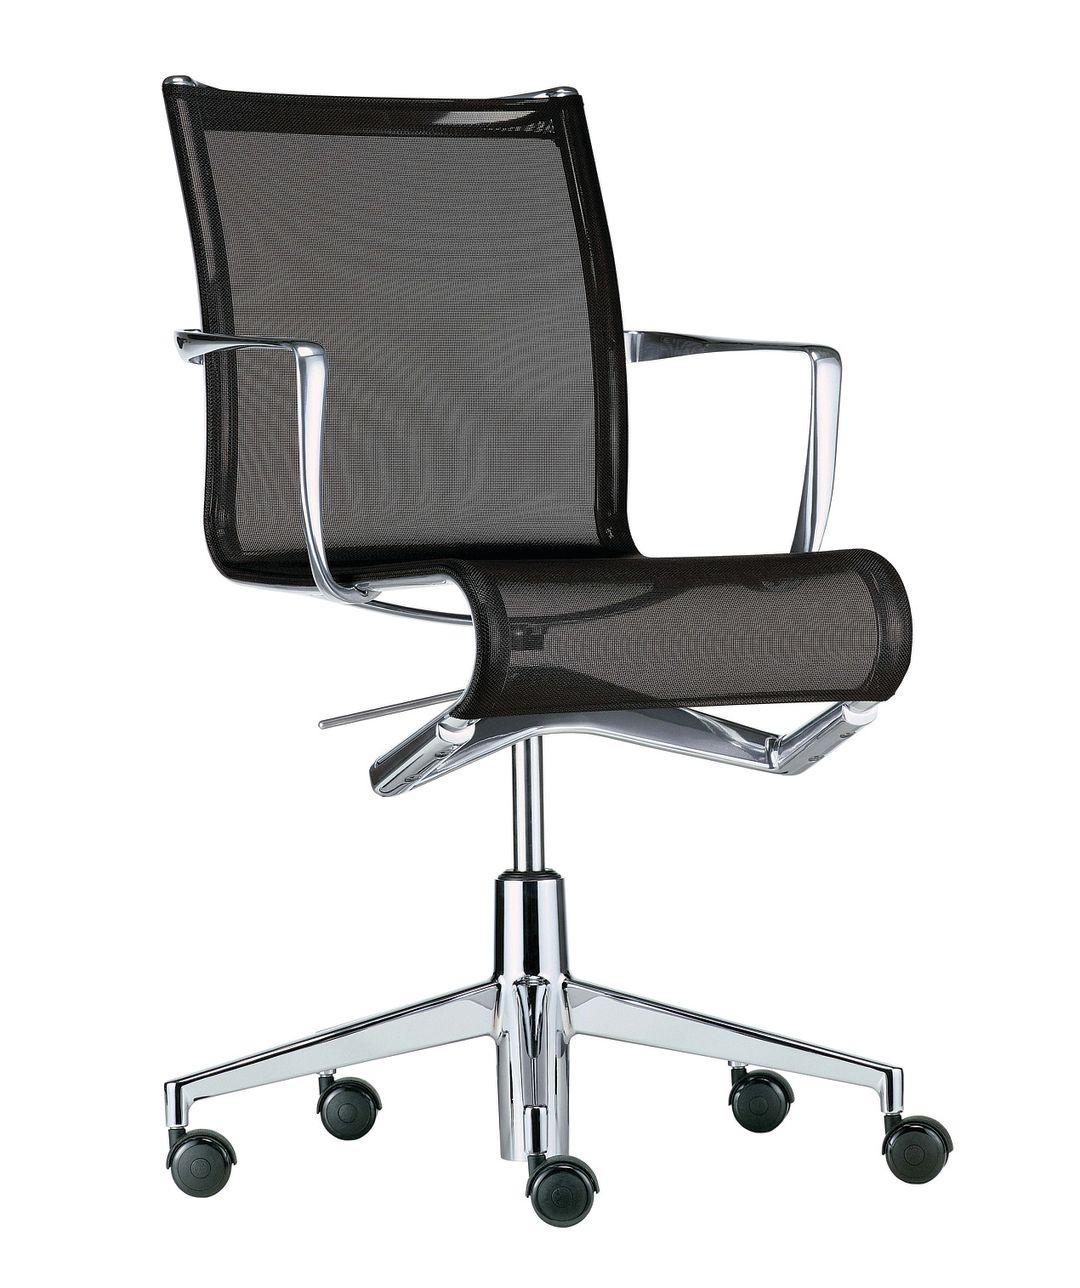 Baseball desk chair - Rolling Frame 434 6 Nfmx94